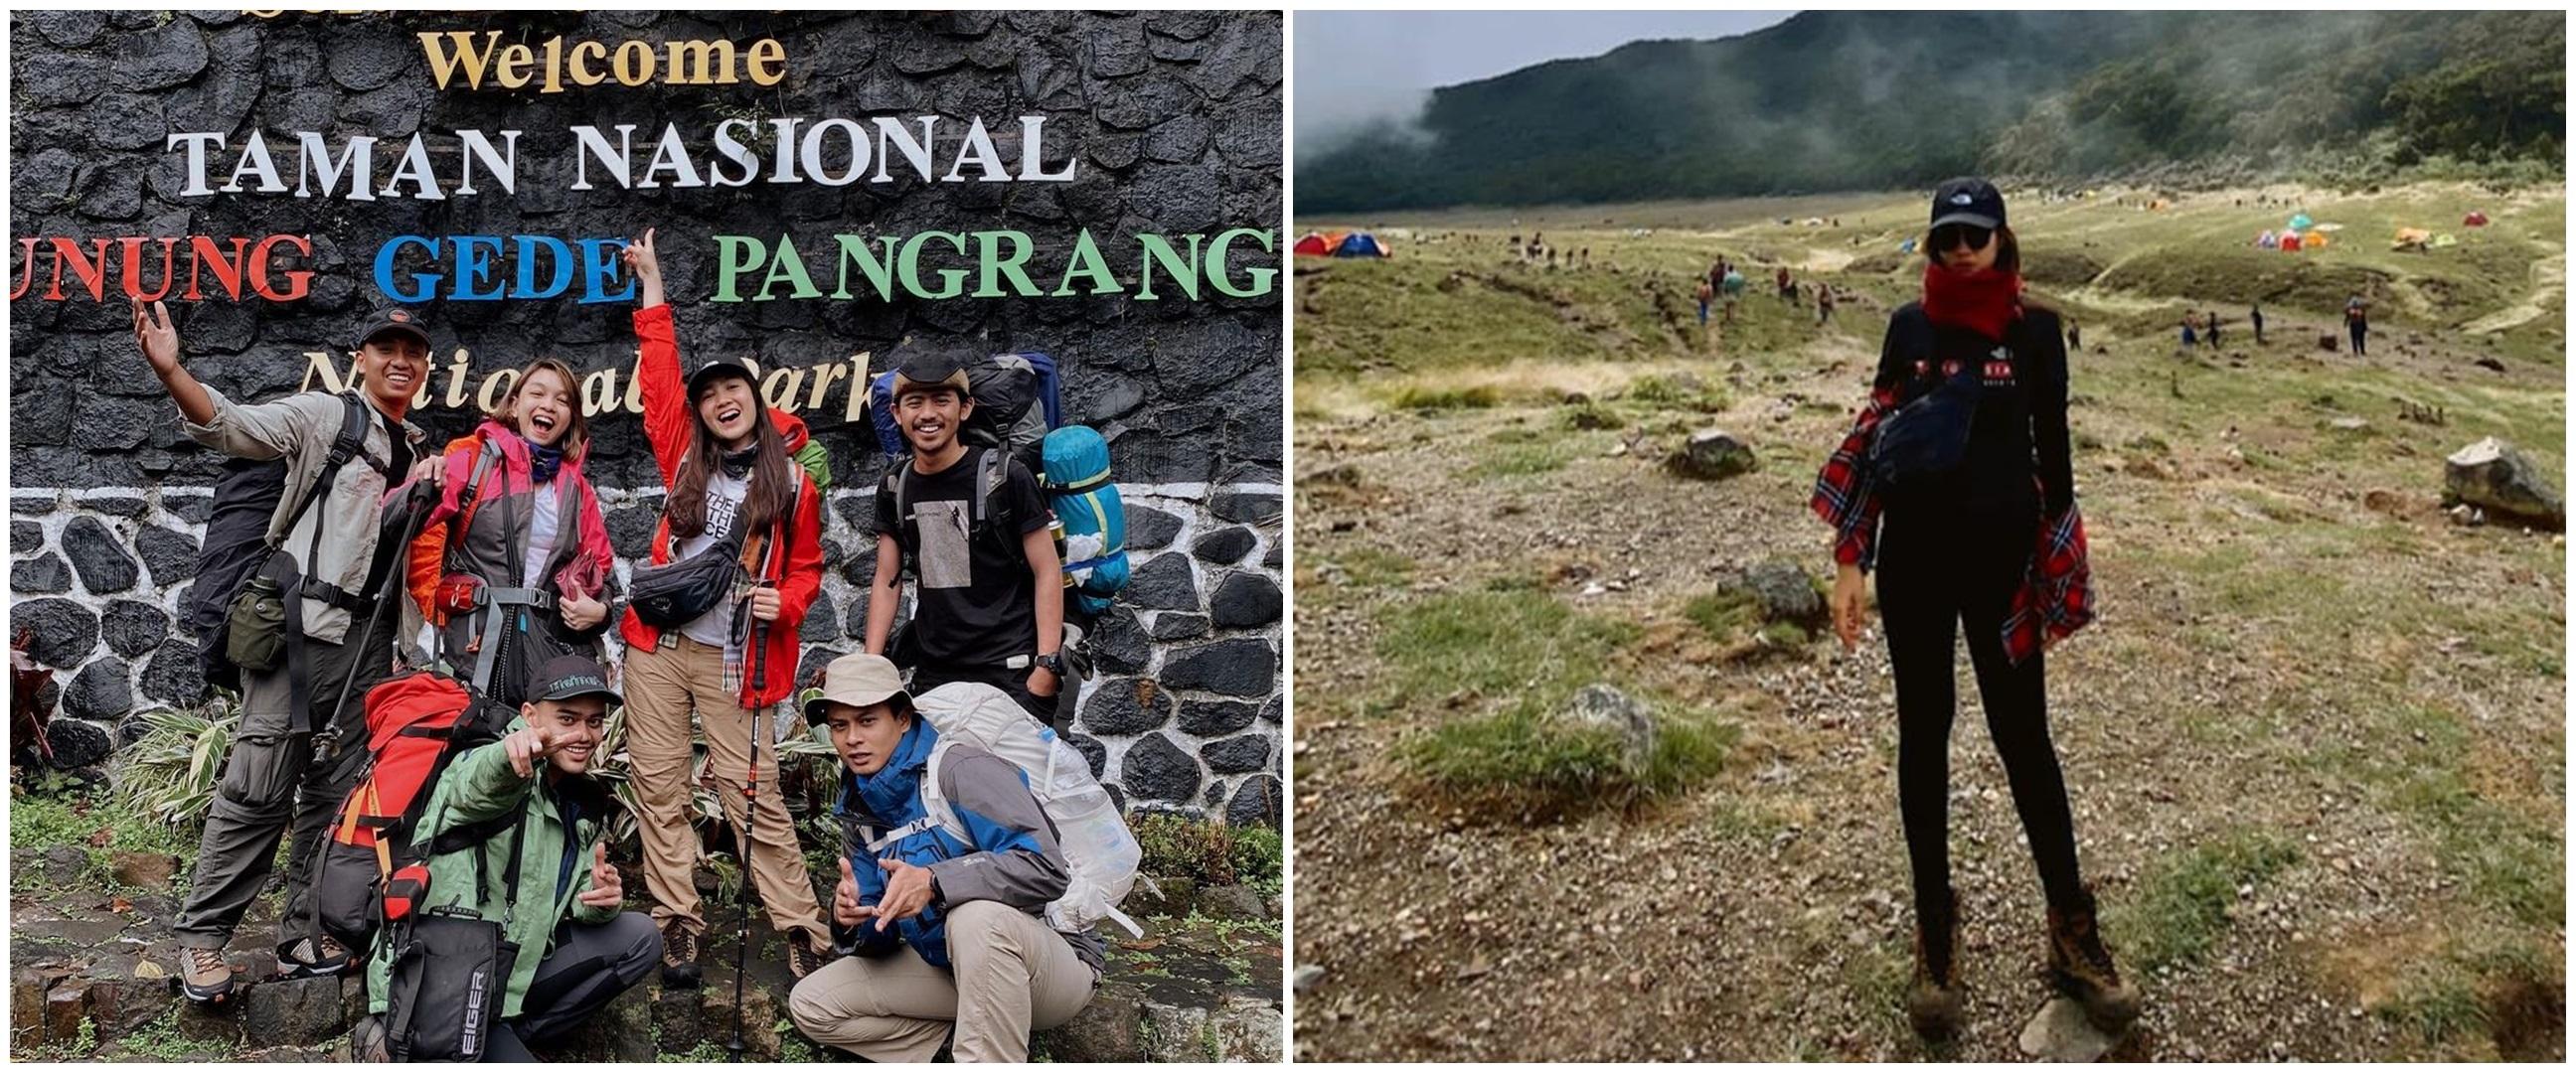 10 Potret pendakian Febby Rastanty di Gunung Pangrango, seru abis